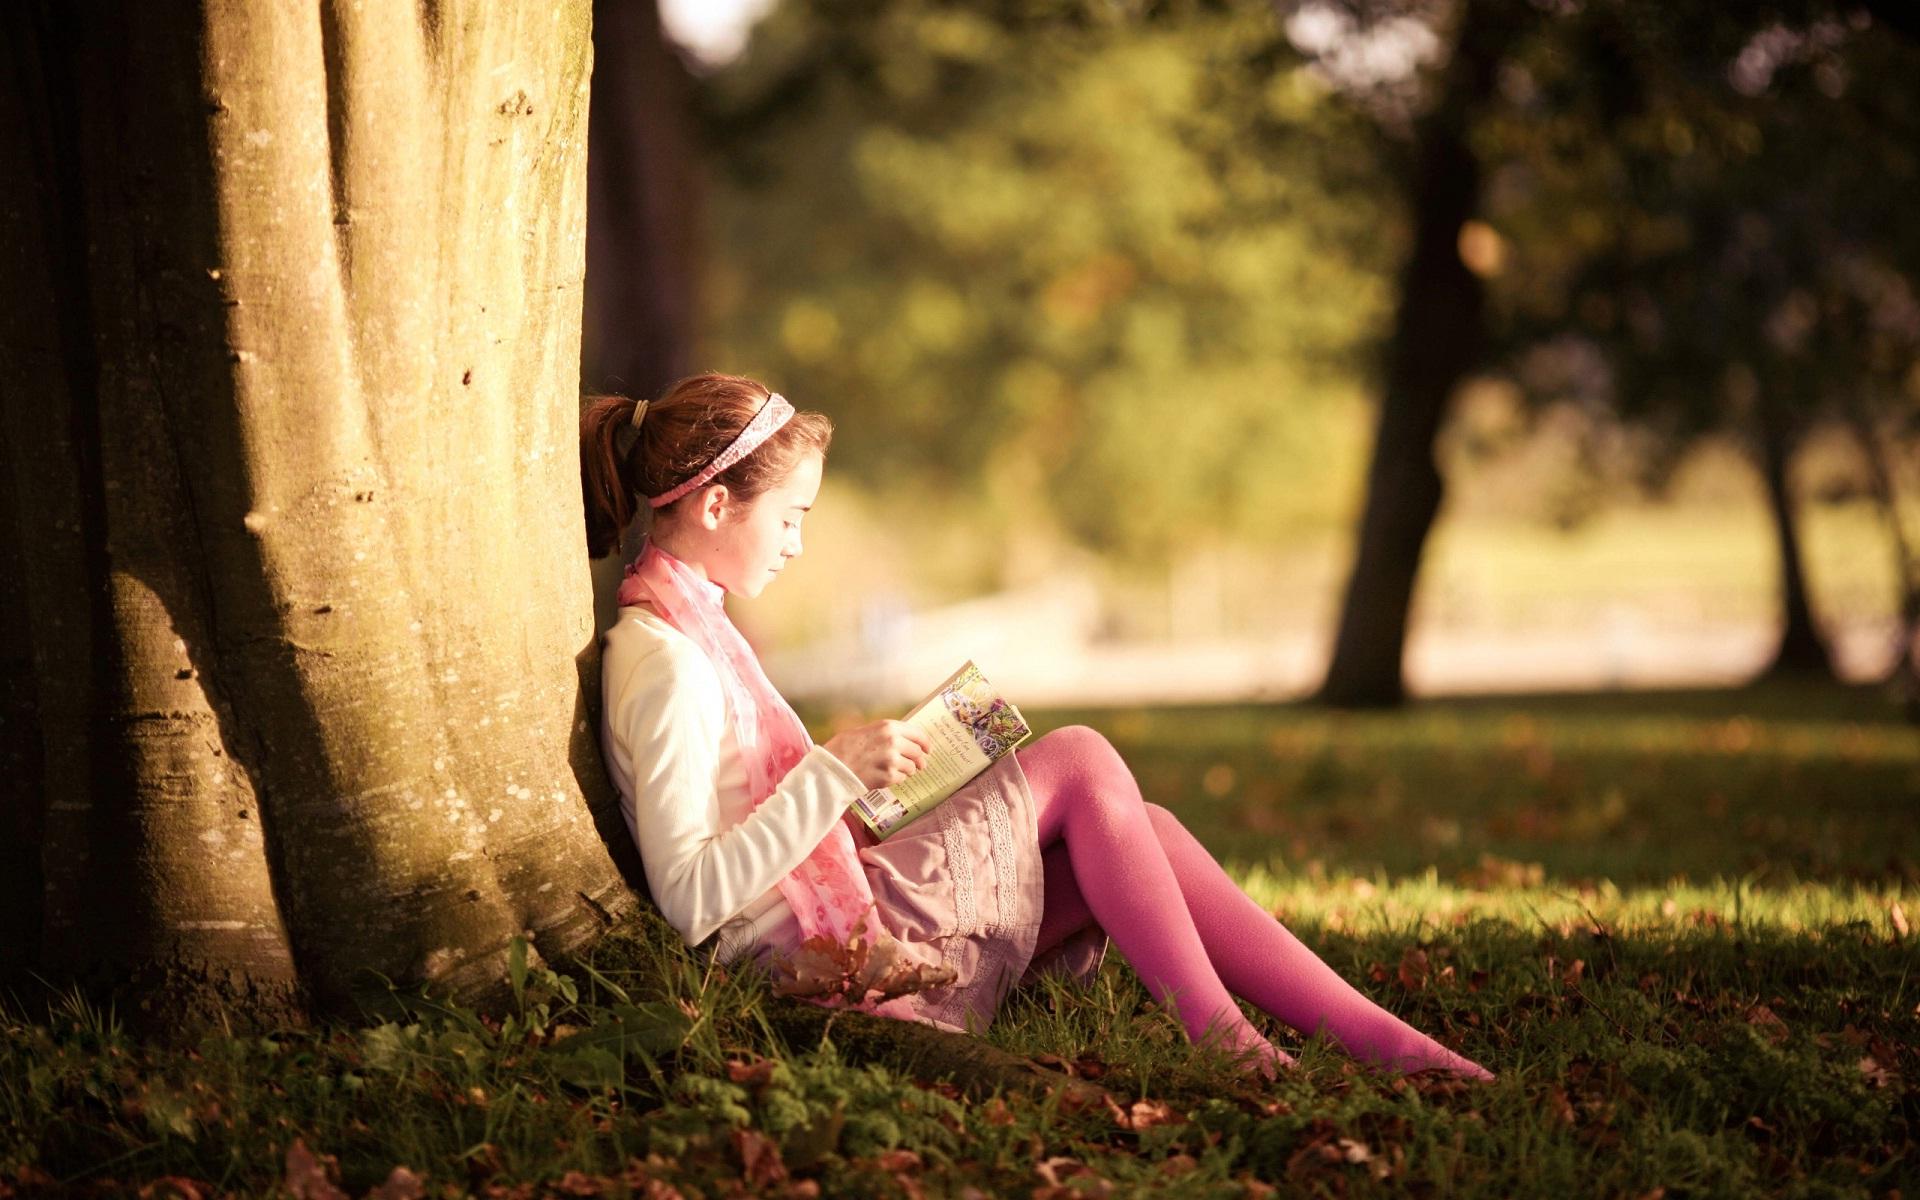 baby reading book in garden